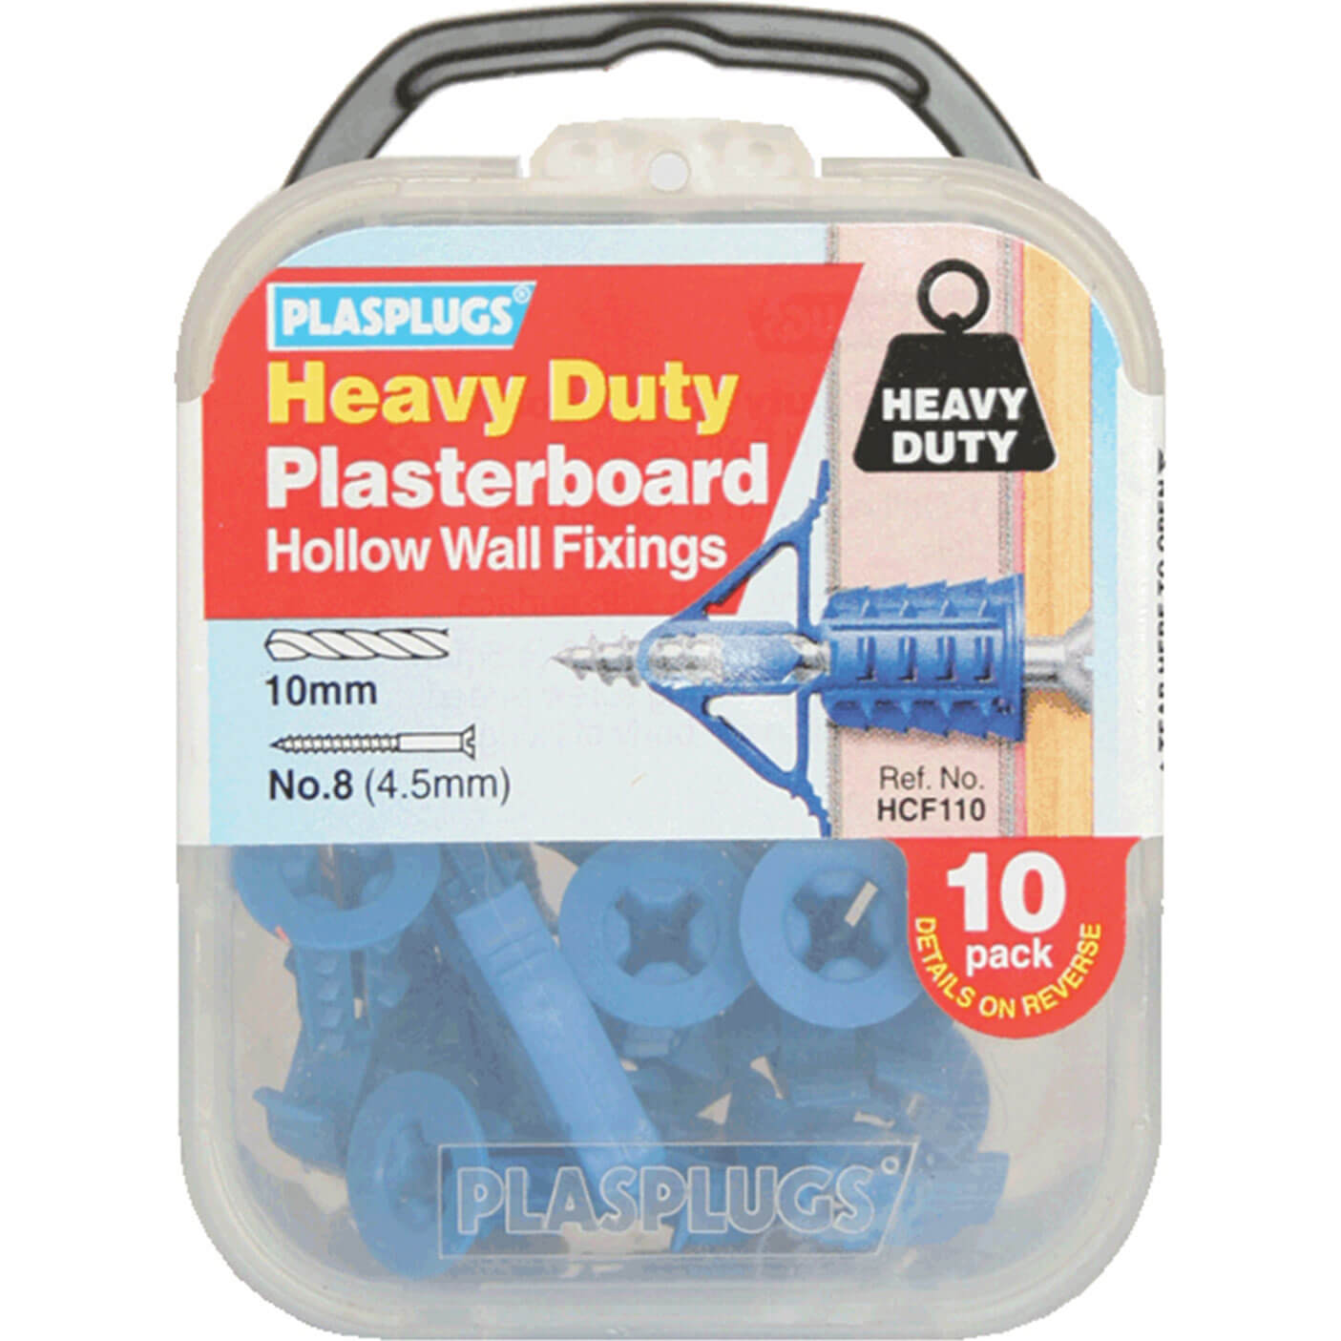 Image of Plasplugs Heavy Duty Plasterboard Hollow Wall Fixings Pack of 10